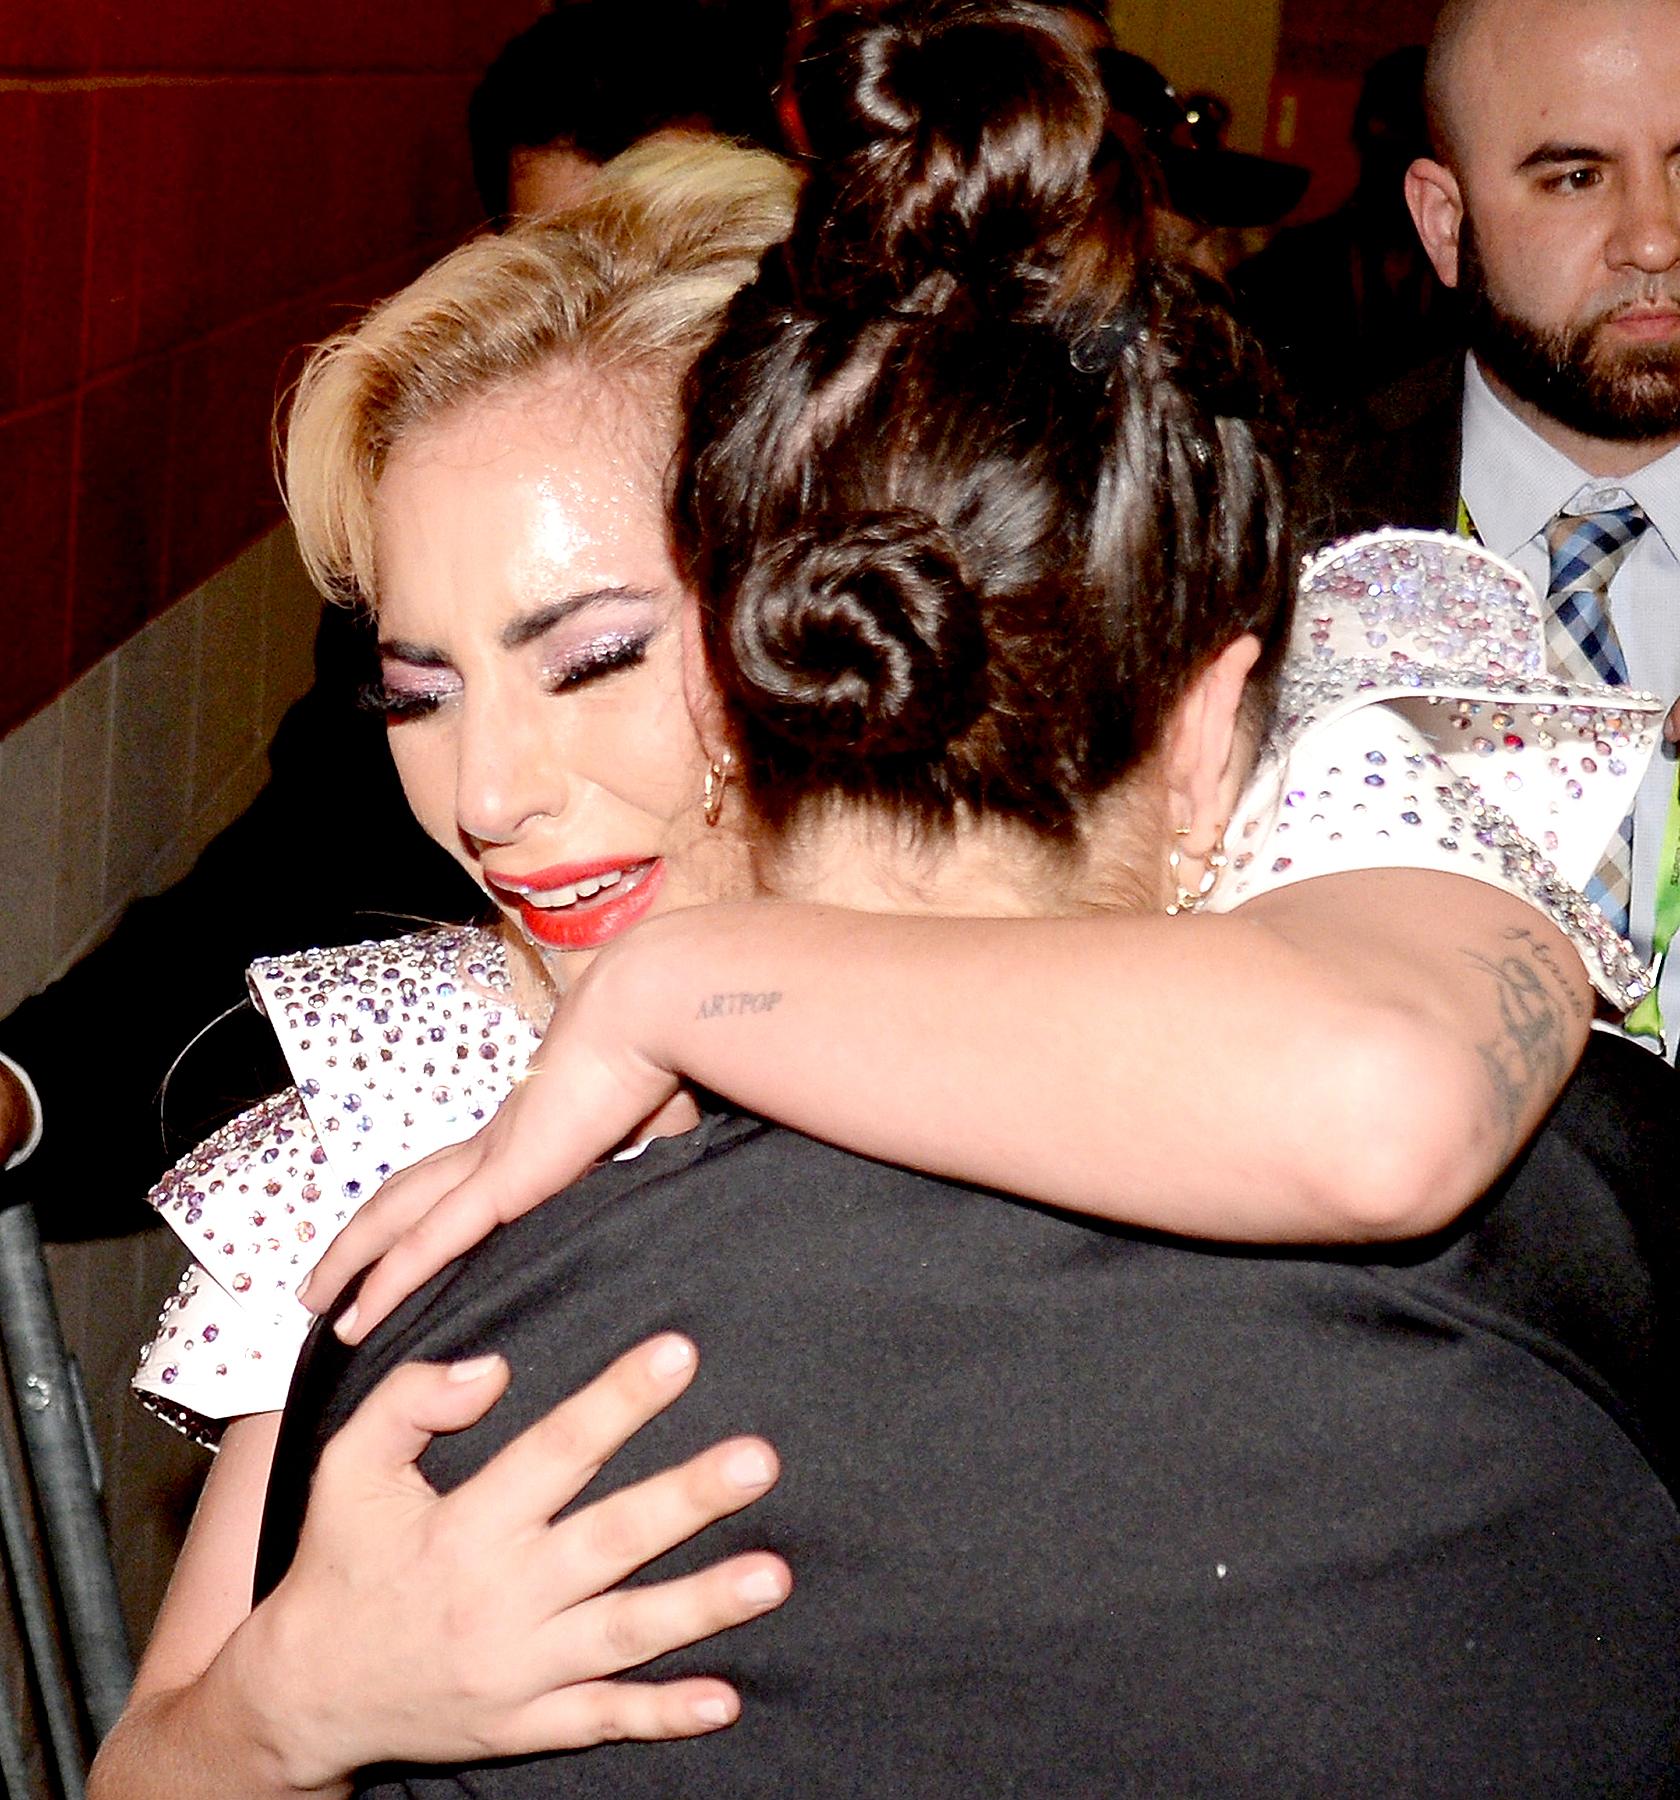 Lady Gaga hugs her sister Natali Germanotta backstage after the Pepsi Zero Sugar Super Bowl LI Halftime Show at NRG Stadium on February 5, 2017 in Houston, Texas.